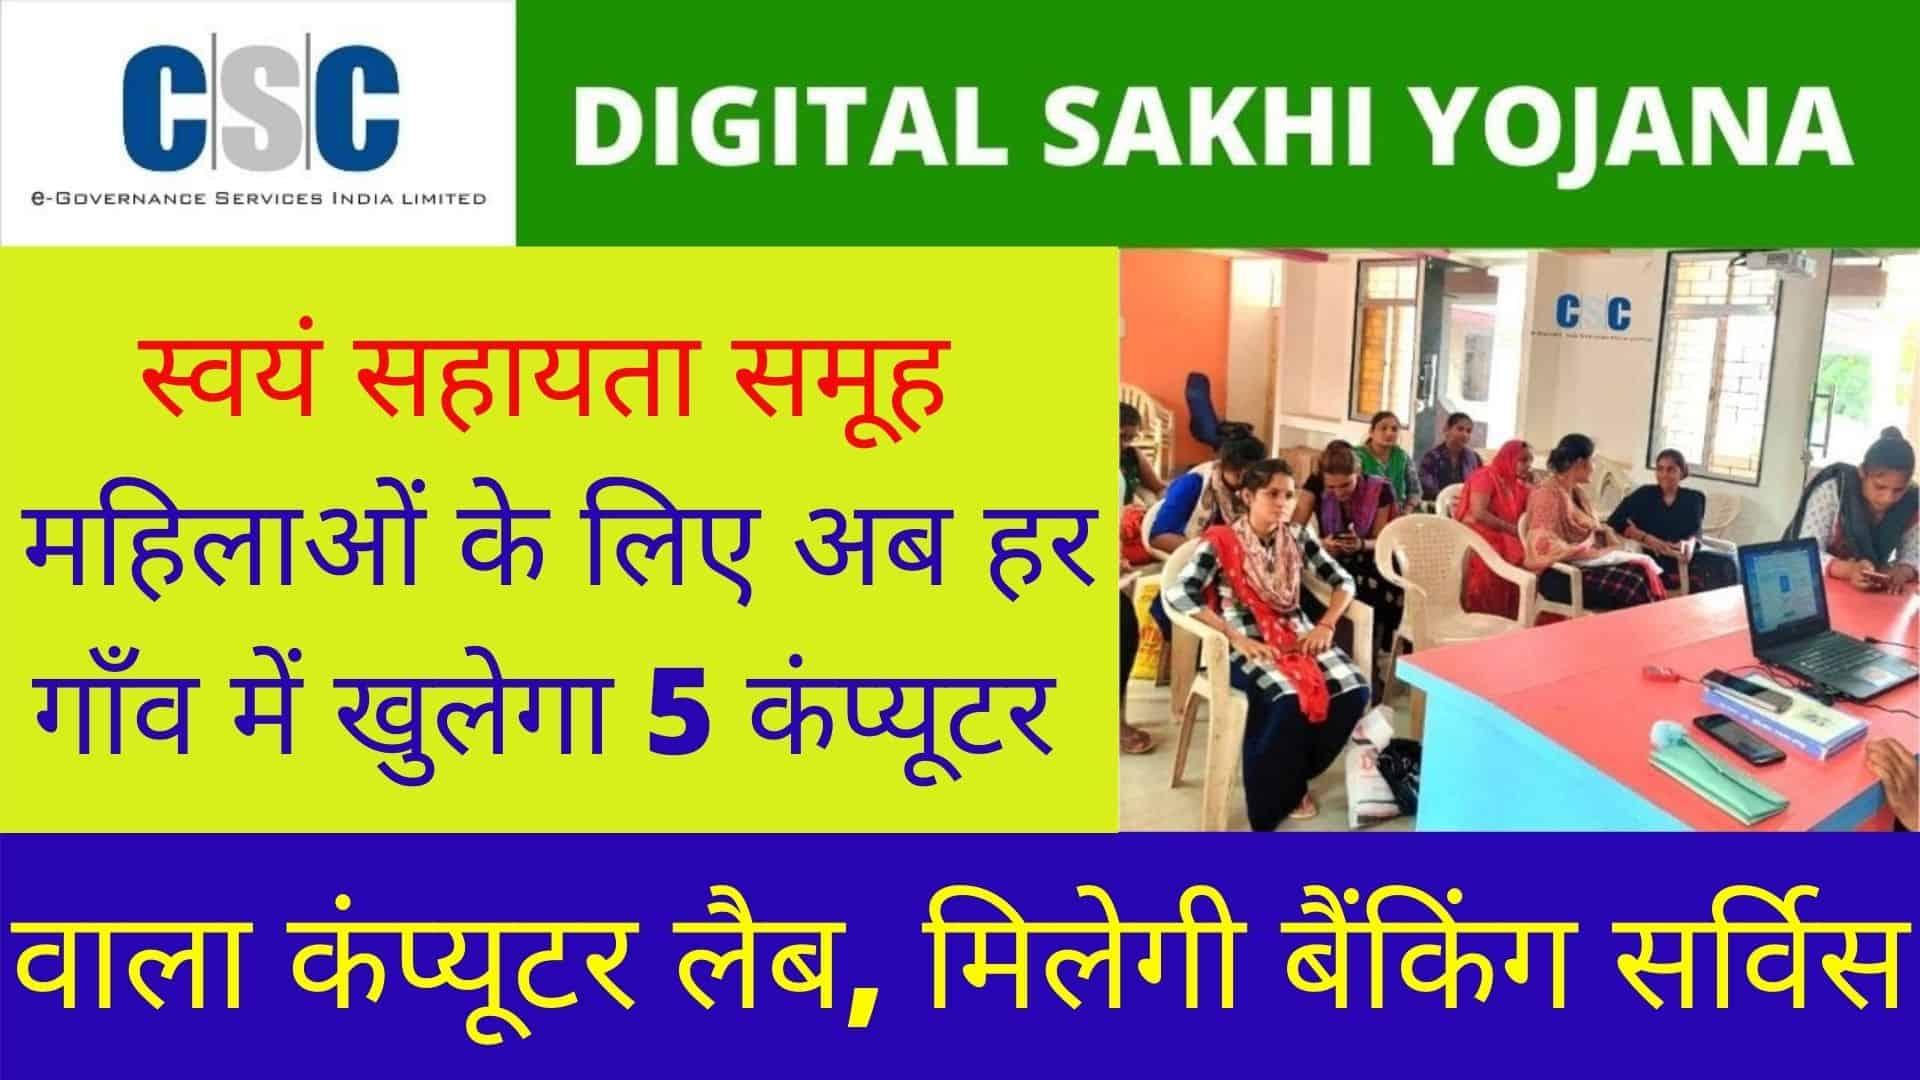 CSC Digital Sakhi Yojana 2020, Computer Traning and Banking Services